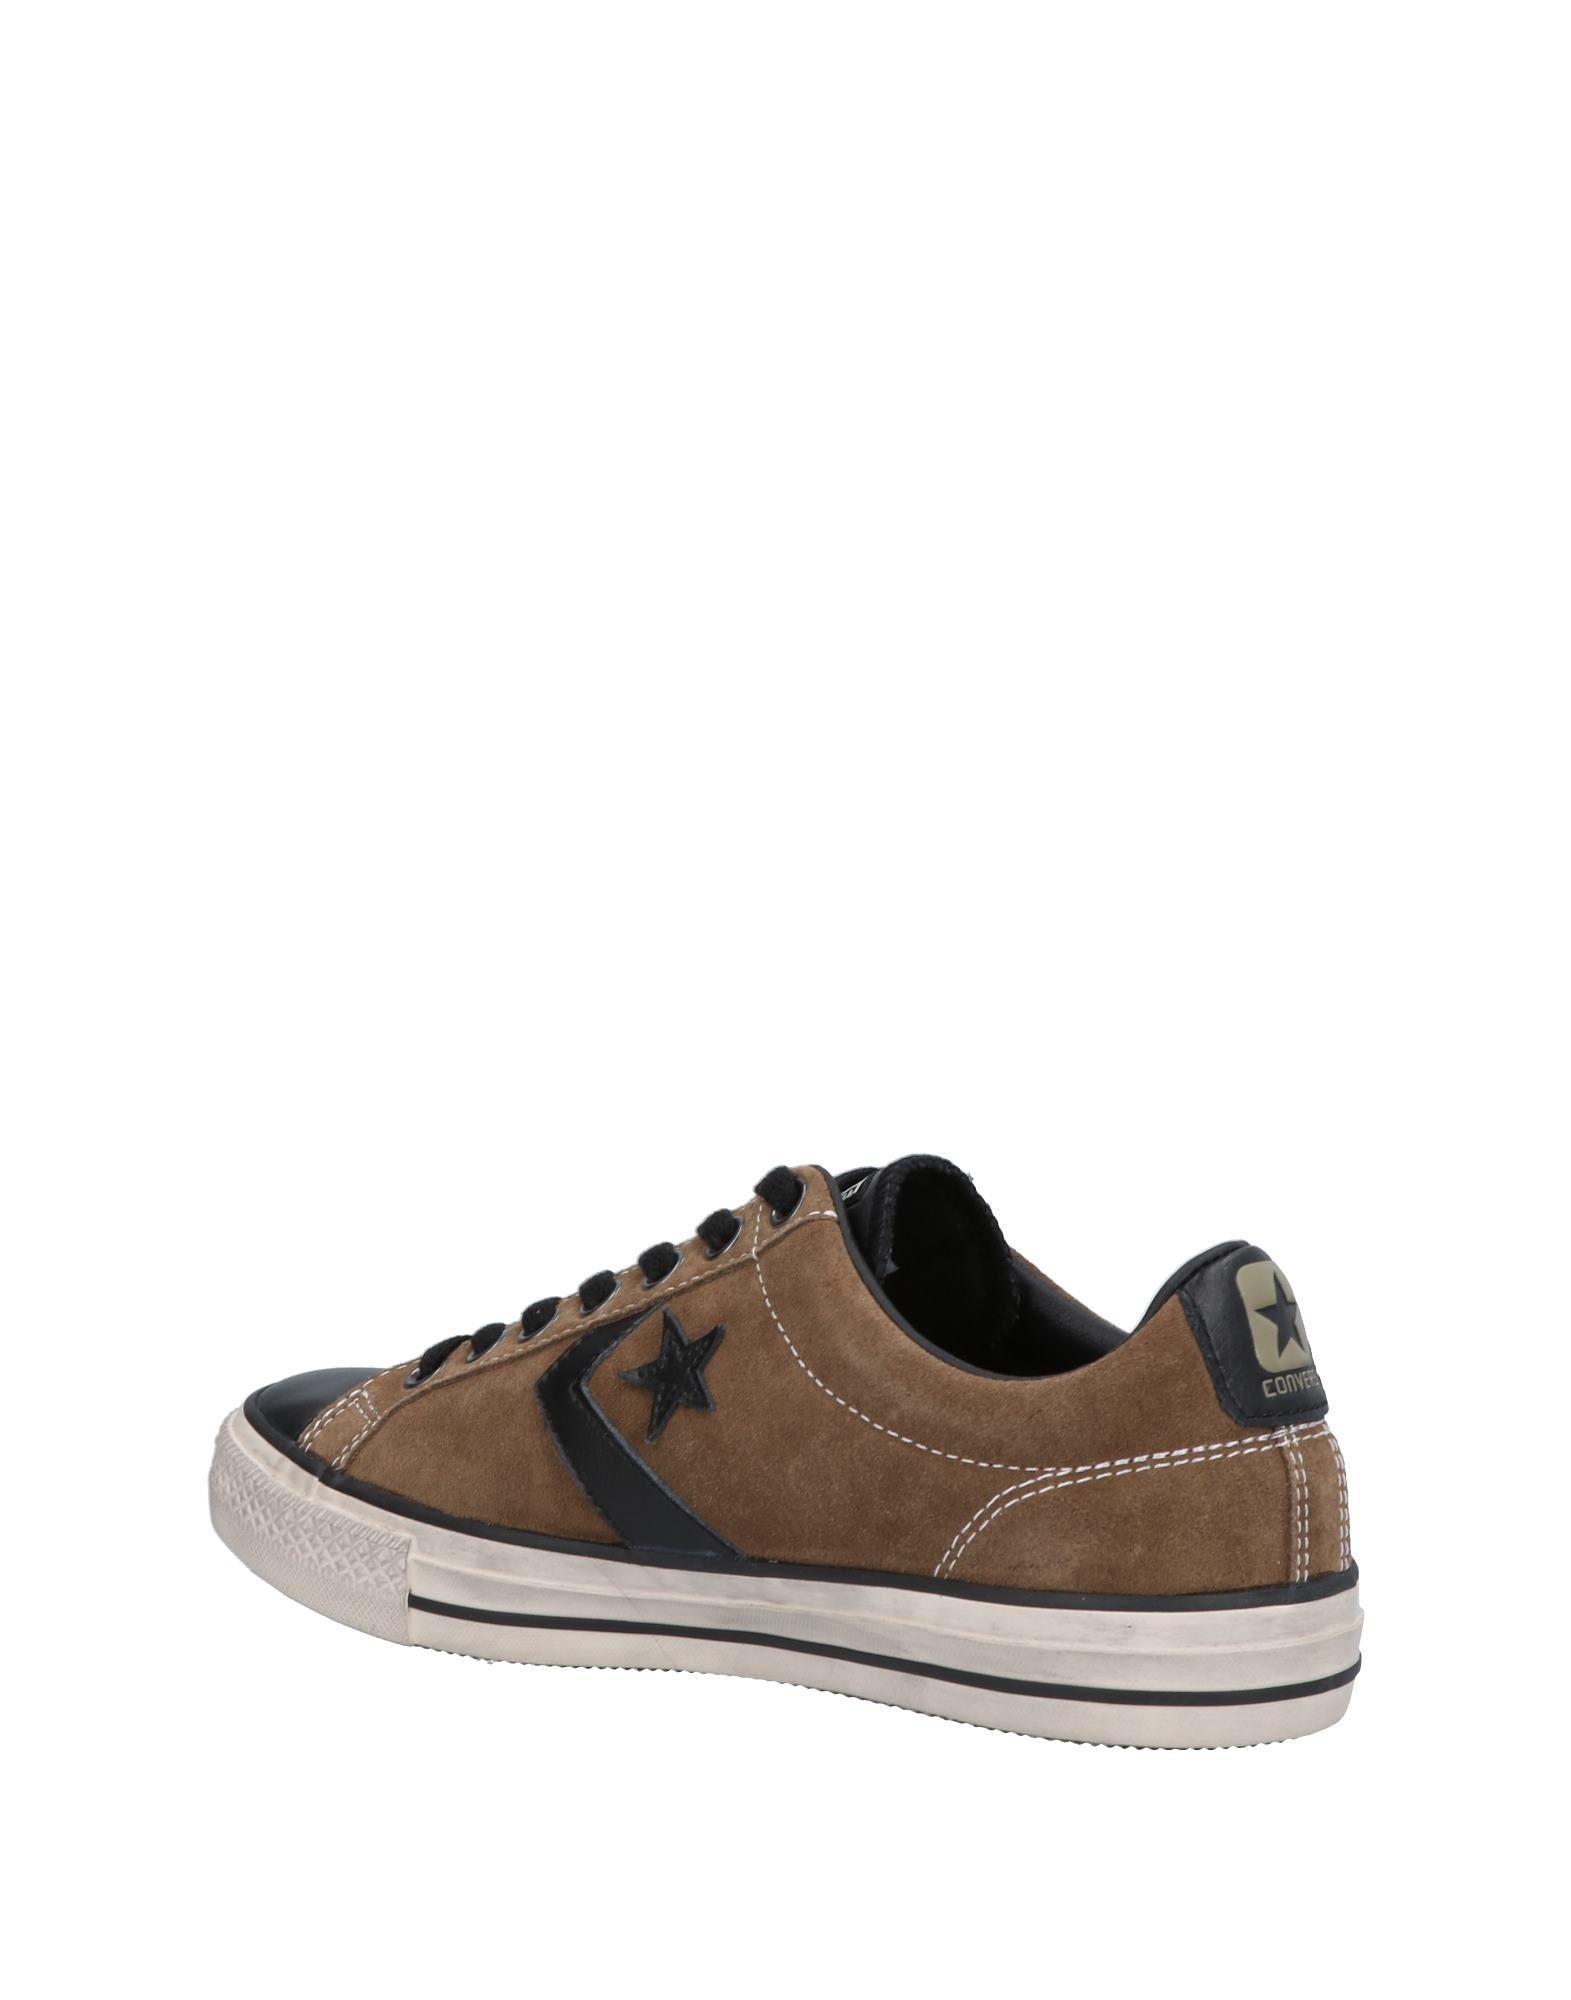 Rabatt echte Schuhe Converse All Star Sneakers Herren  11448852JL